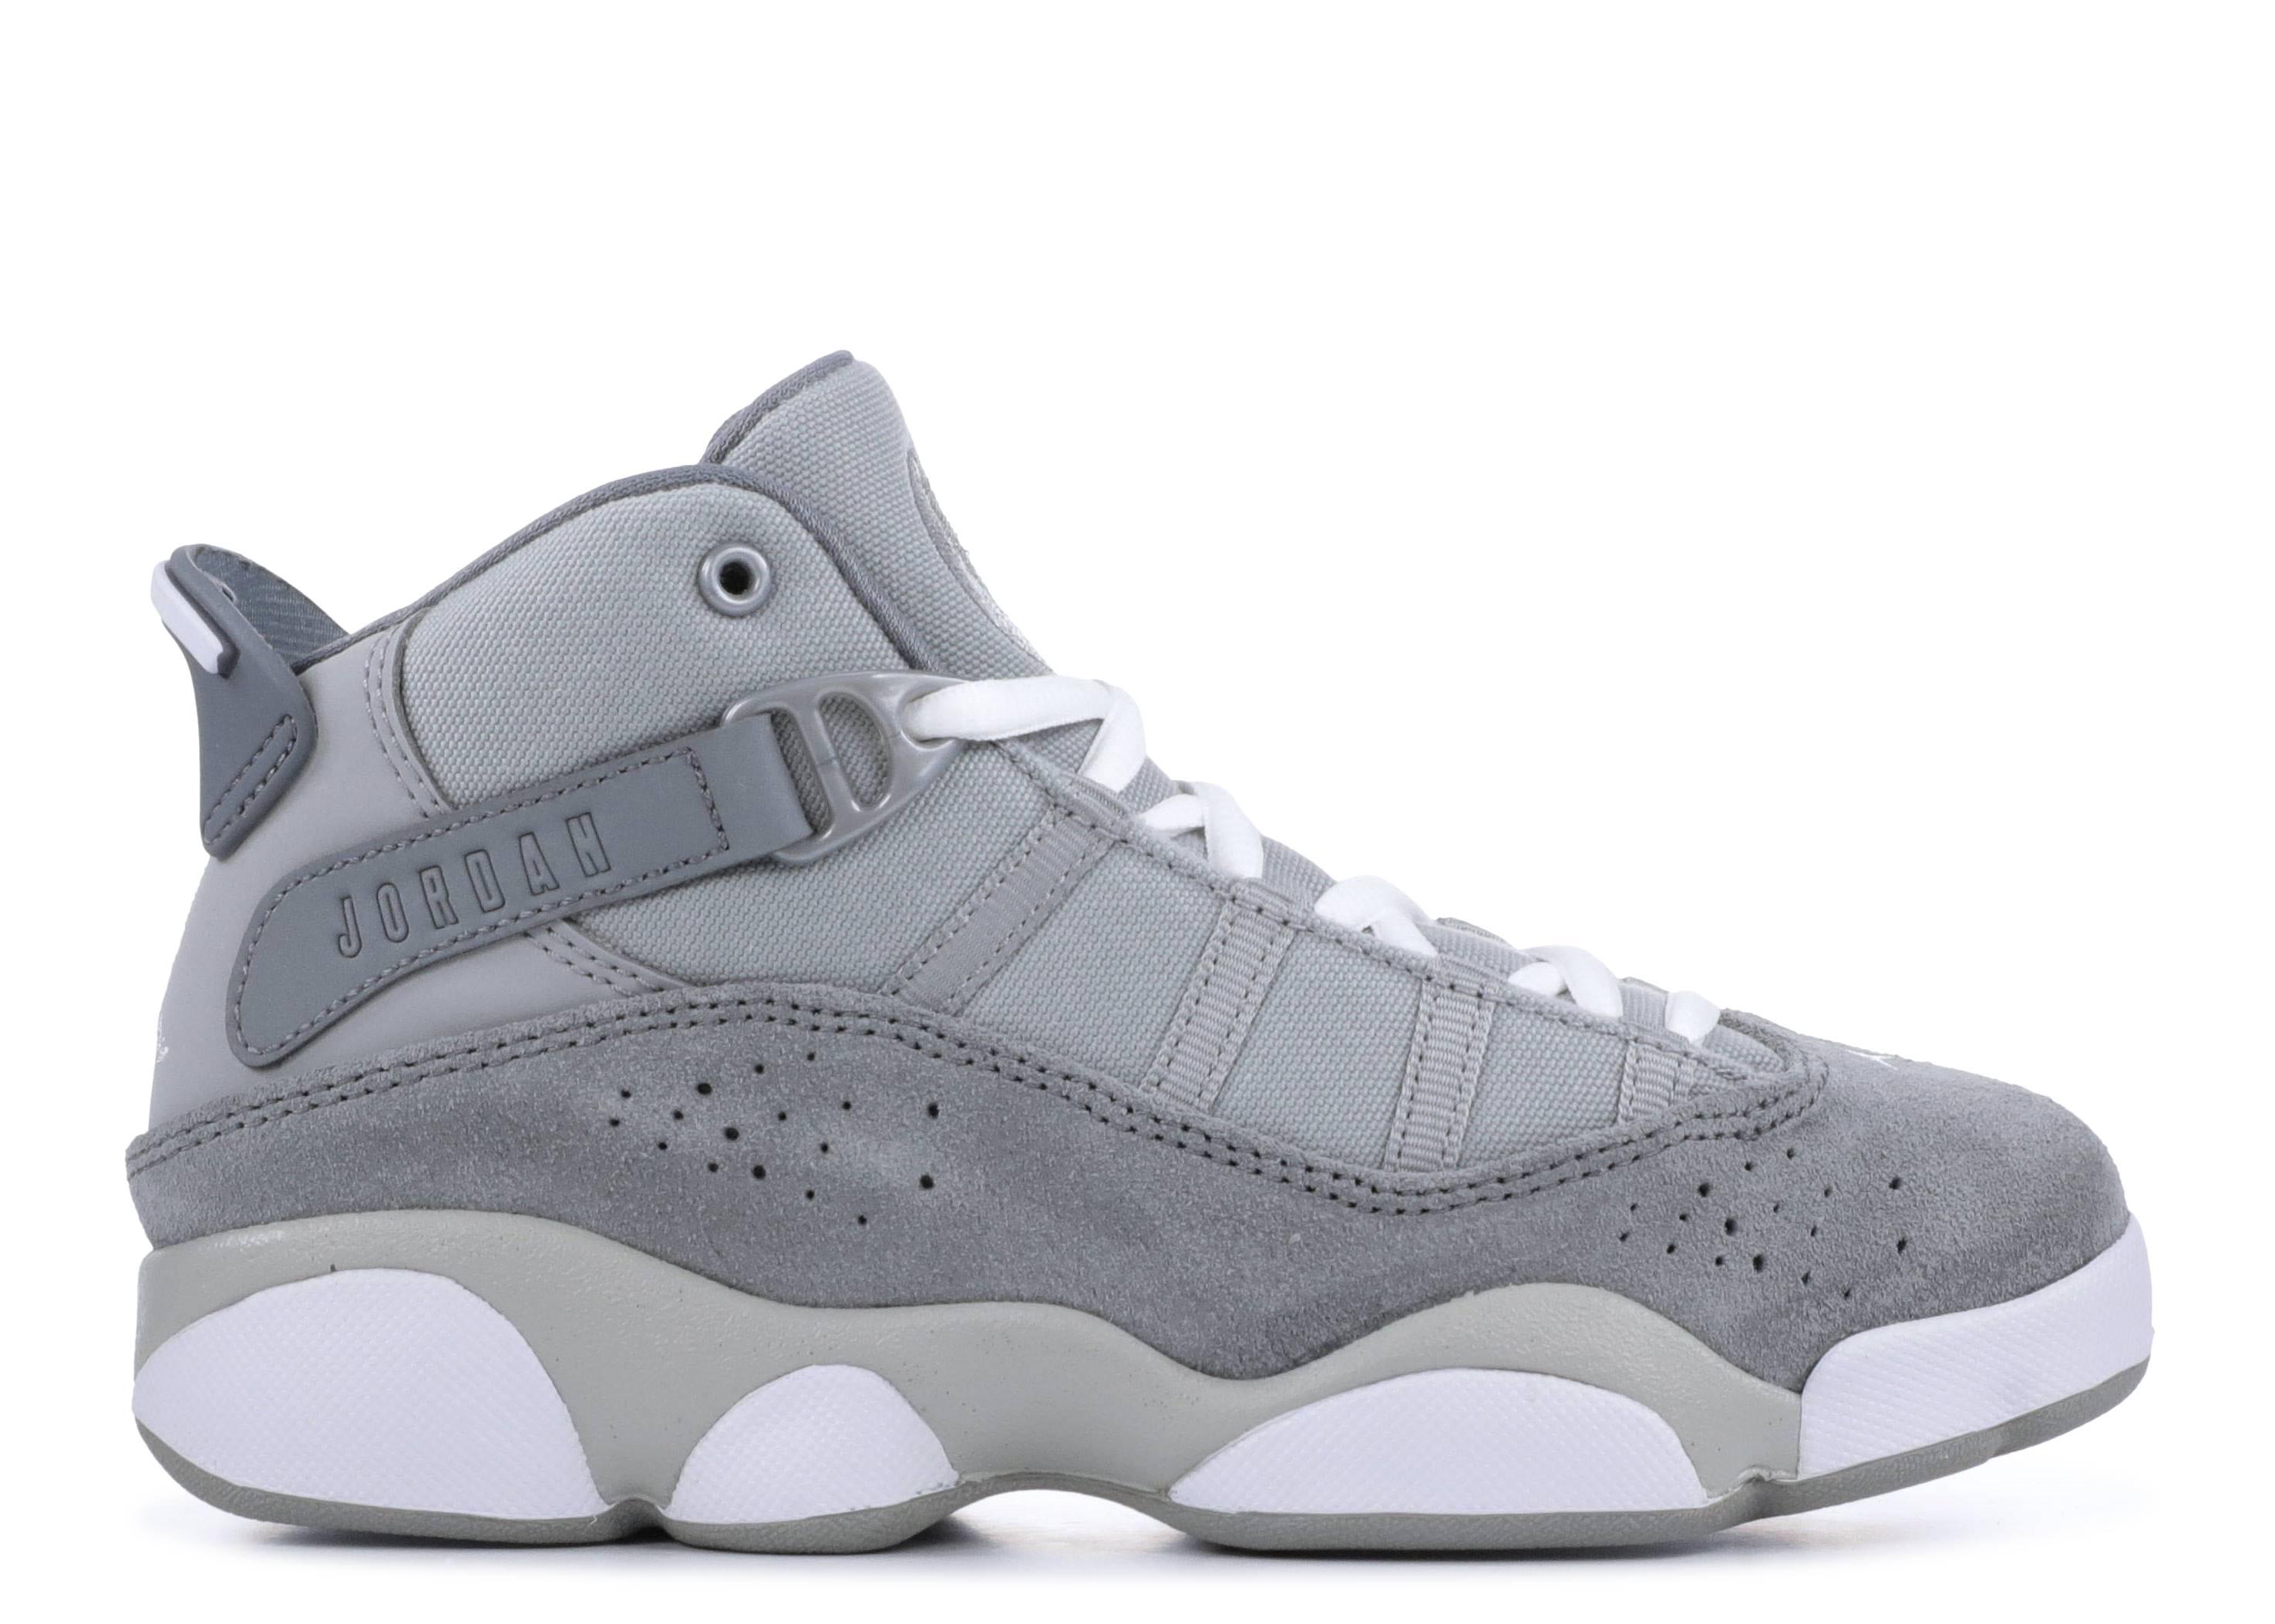 sports shoes d4a2d 7ae34 Boys Air Jordan Shoes   Lower Price